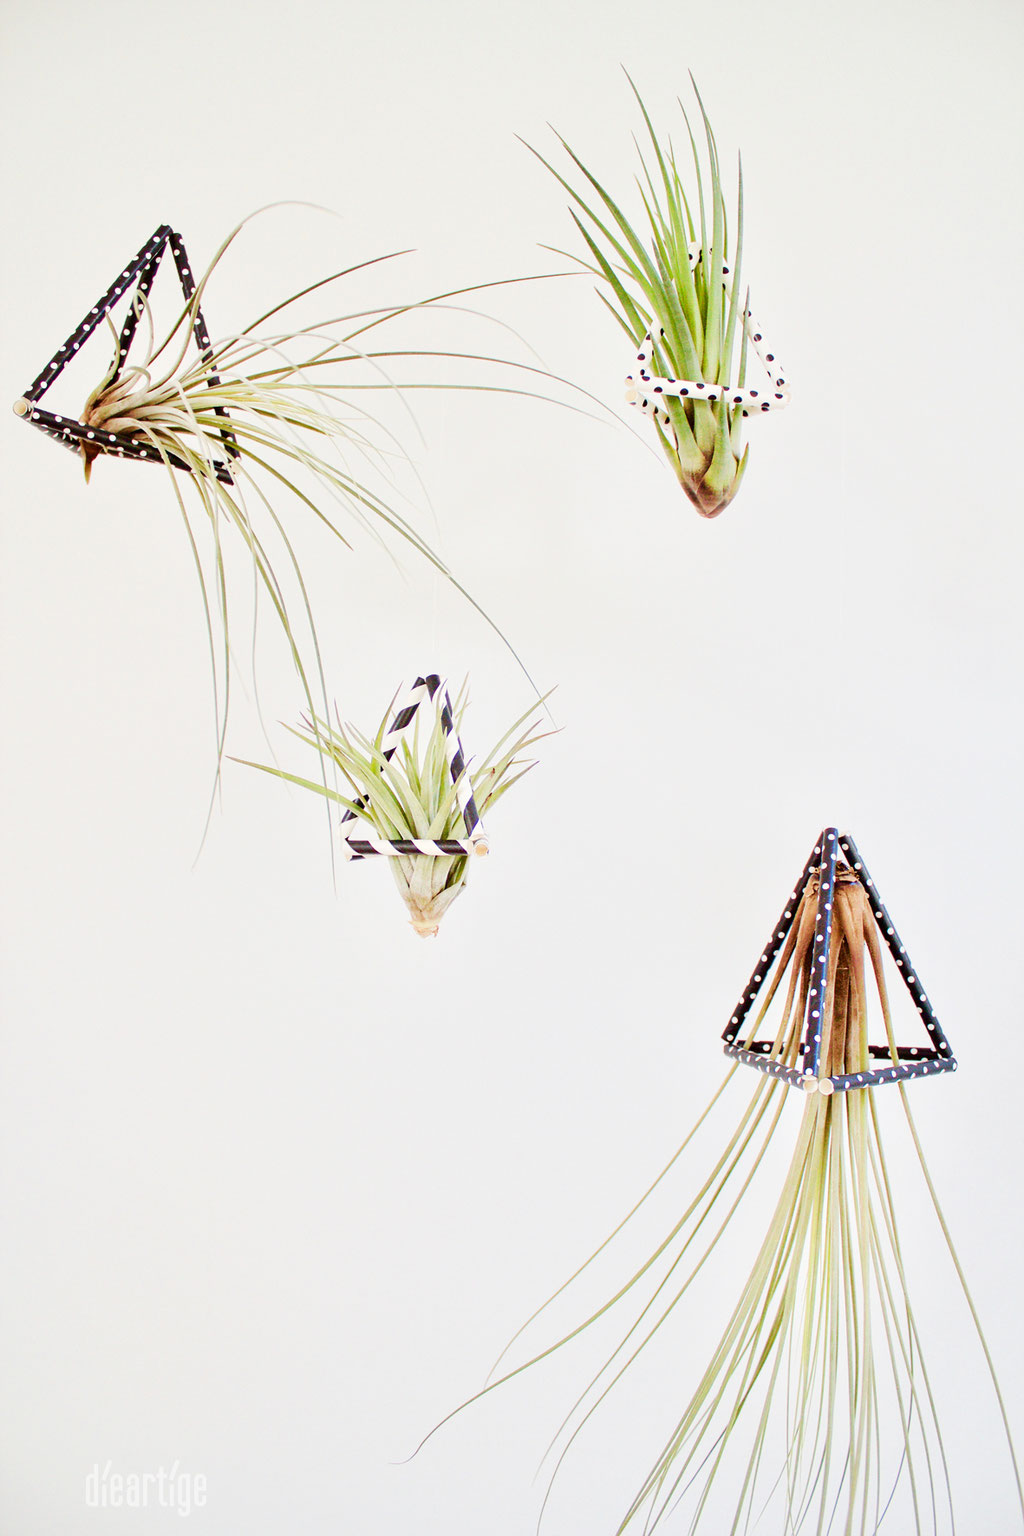 dieartigeBLOG - DIY / Tillandsien im Dreieck - Groß + Klein